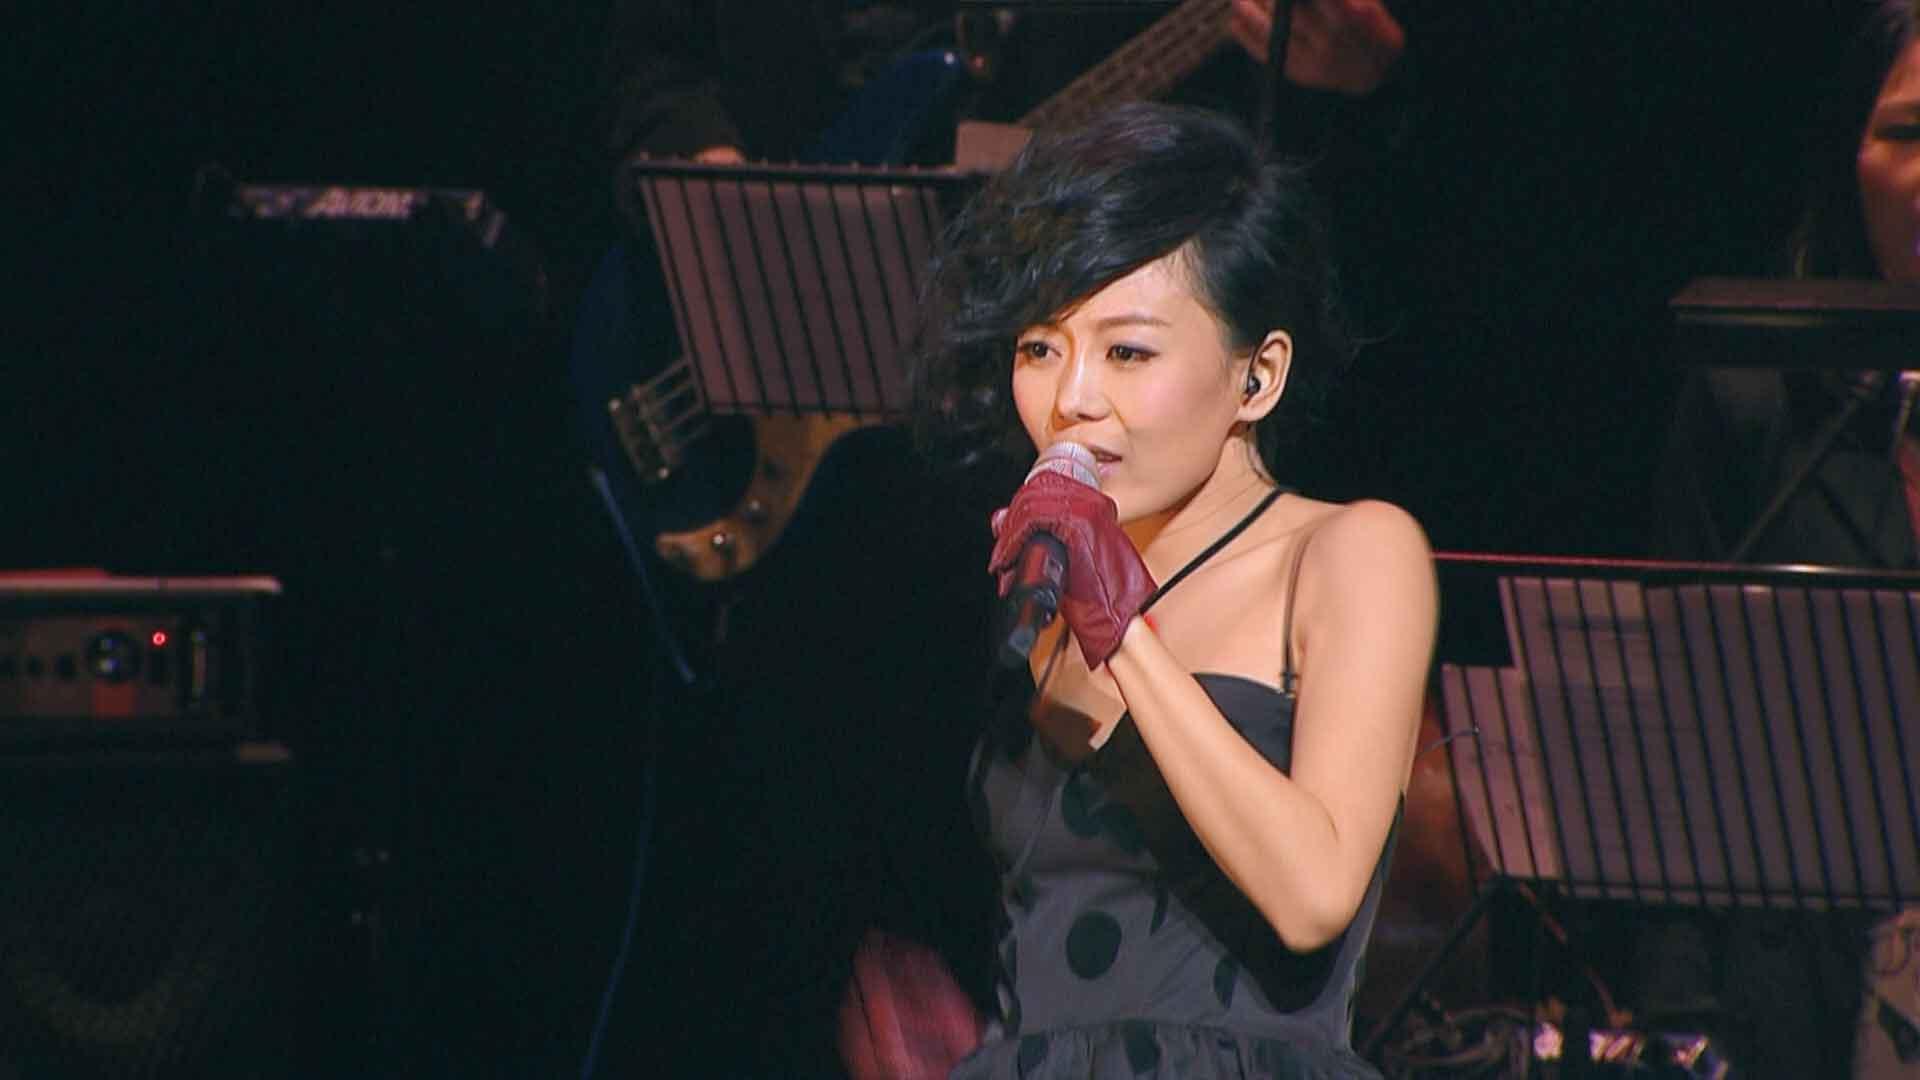 [蓝光原盘] 胡琳Bianca Live演唱会Bianca Wu Bianca Live 2011 HK《ISO 44.49G》